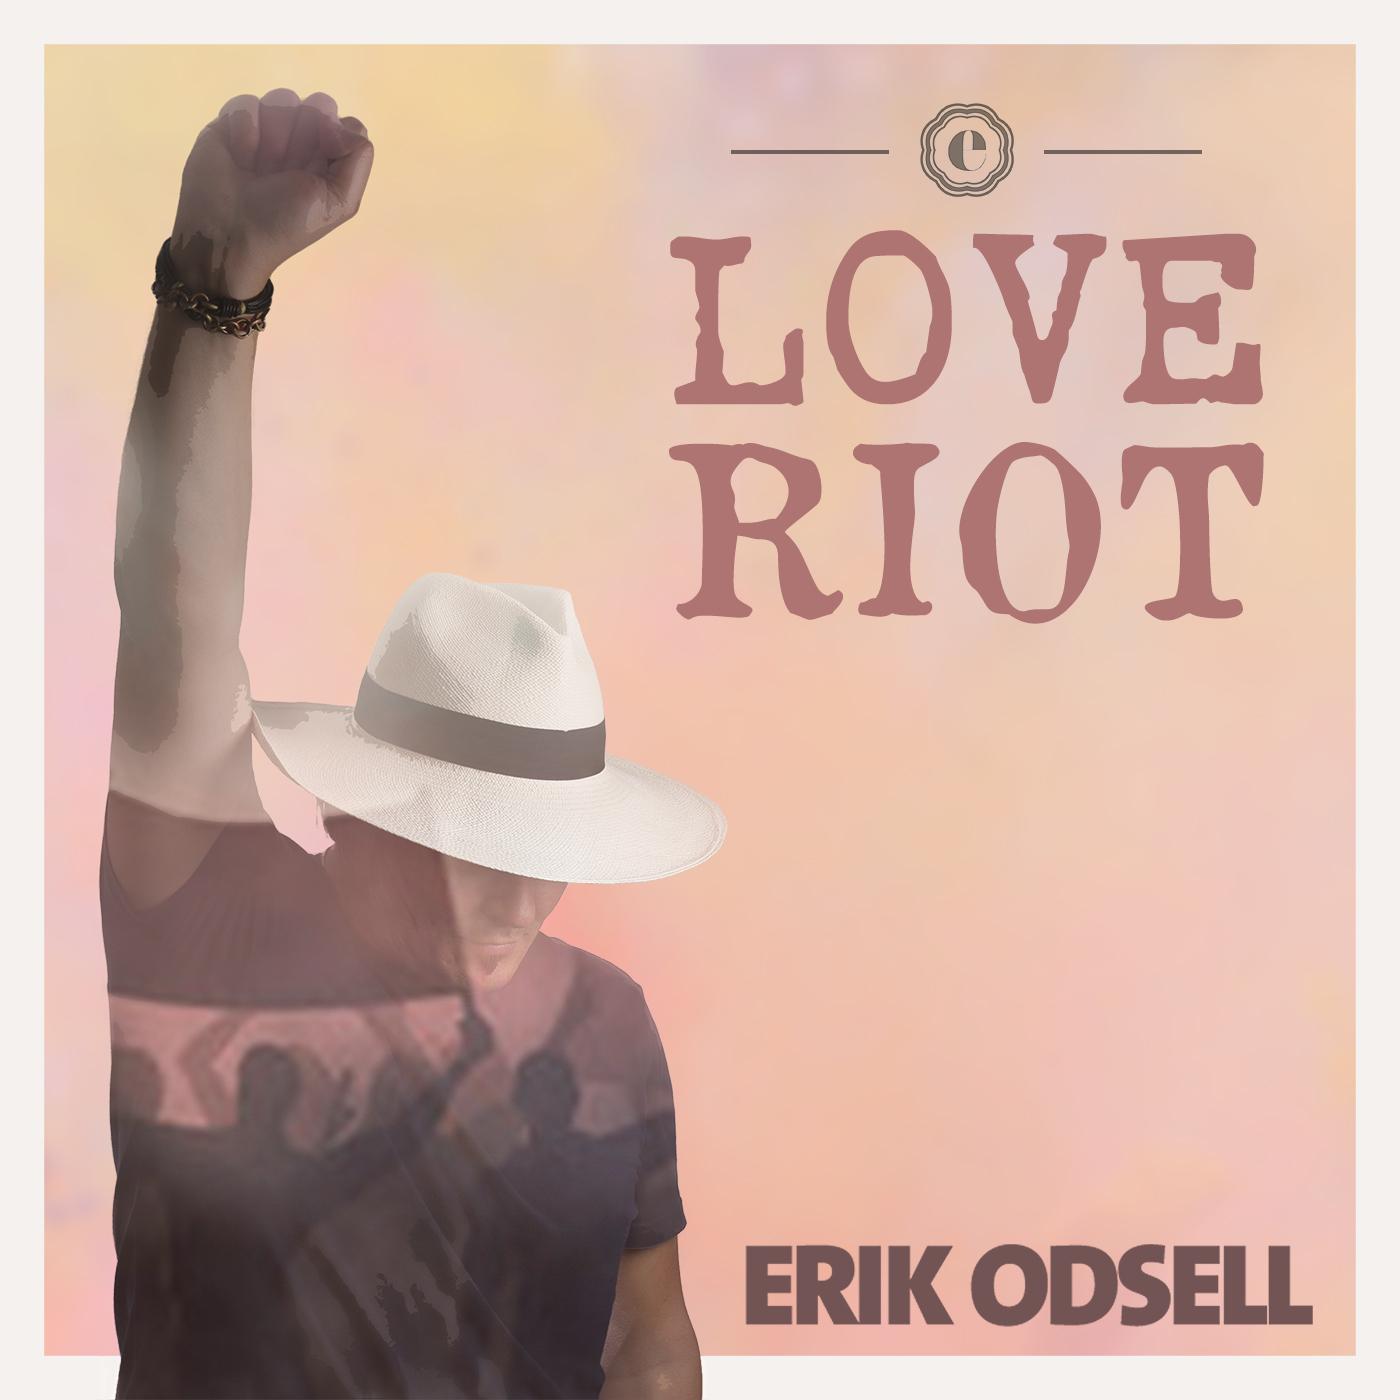 Erik Odsell-Love Riot